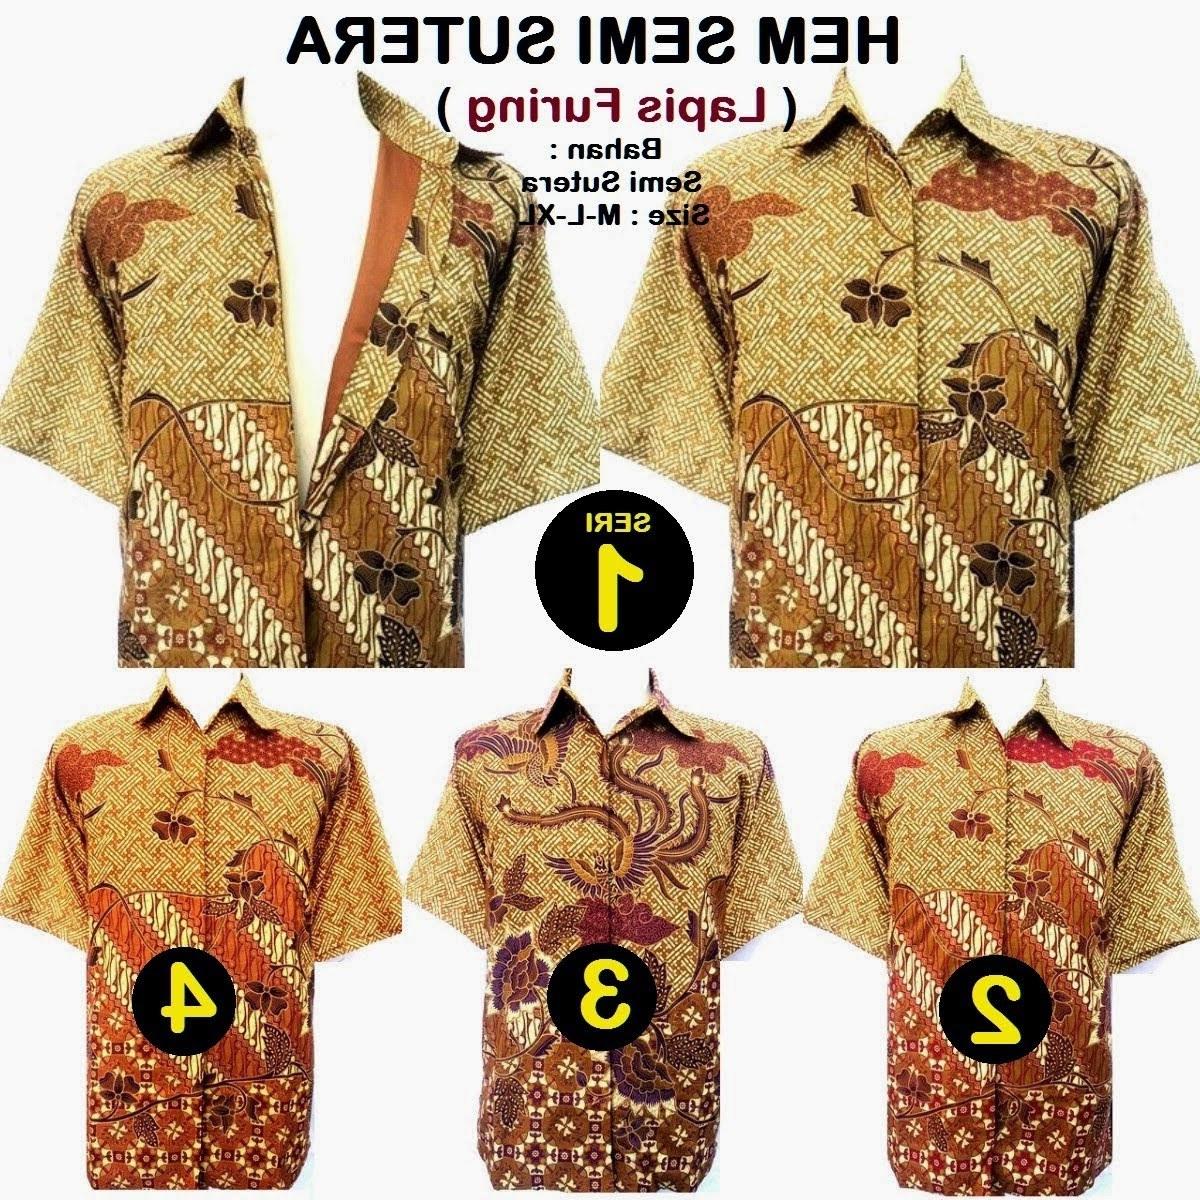 Ide Baju Lebaran Murah Meriah Tqd3 Arnietha Rumah Batik solo Paling Murah